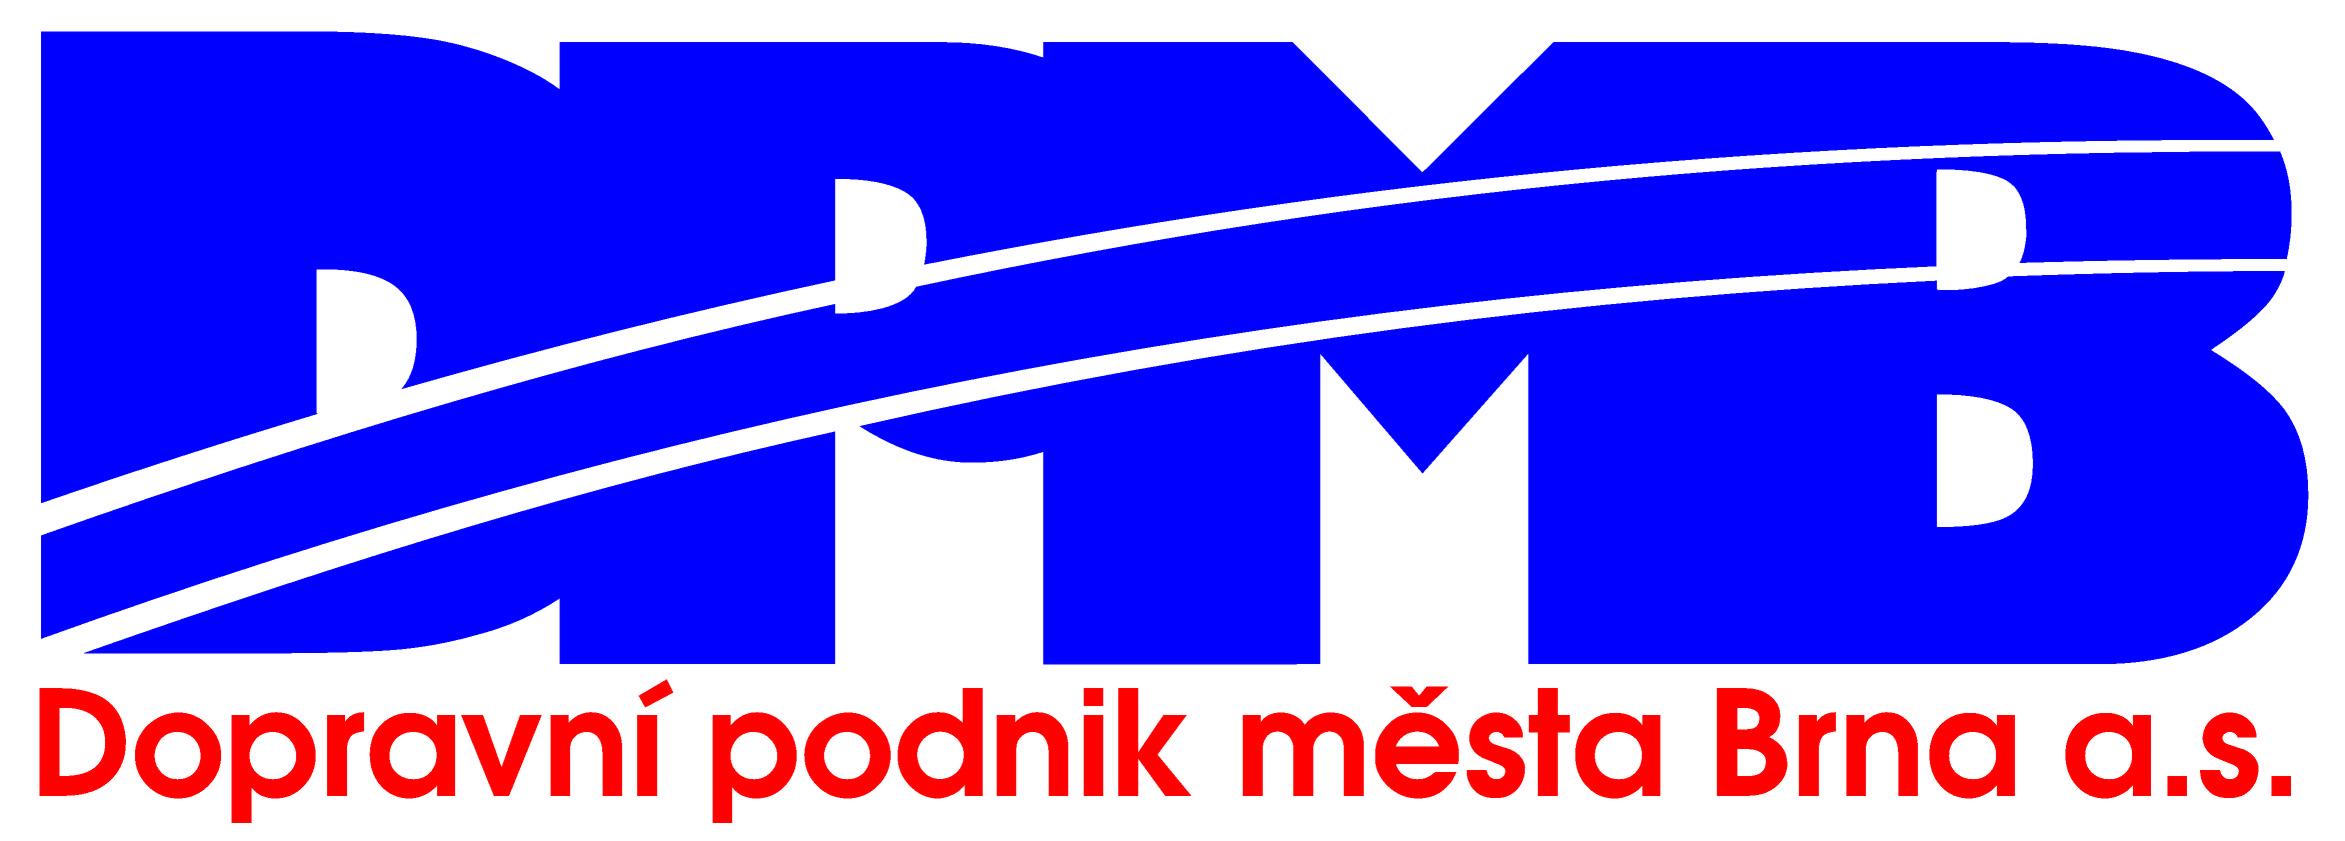 logo DPMB.jpg